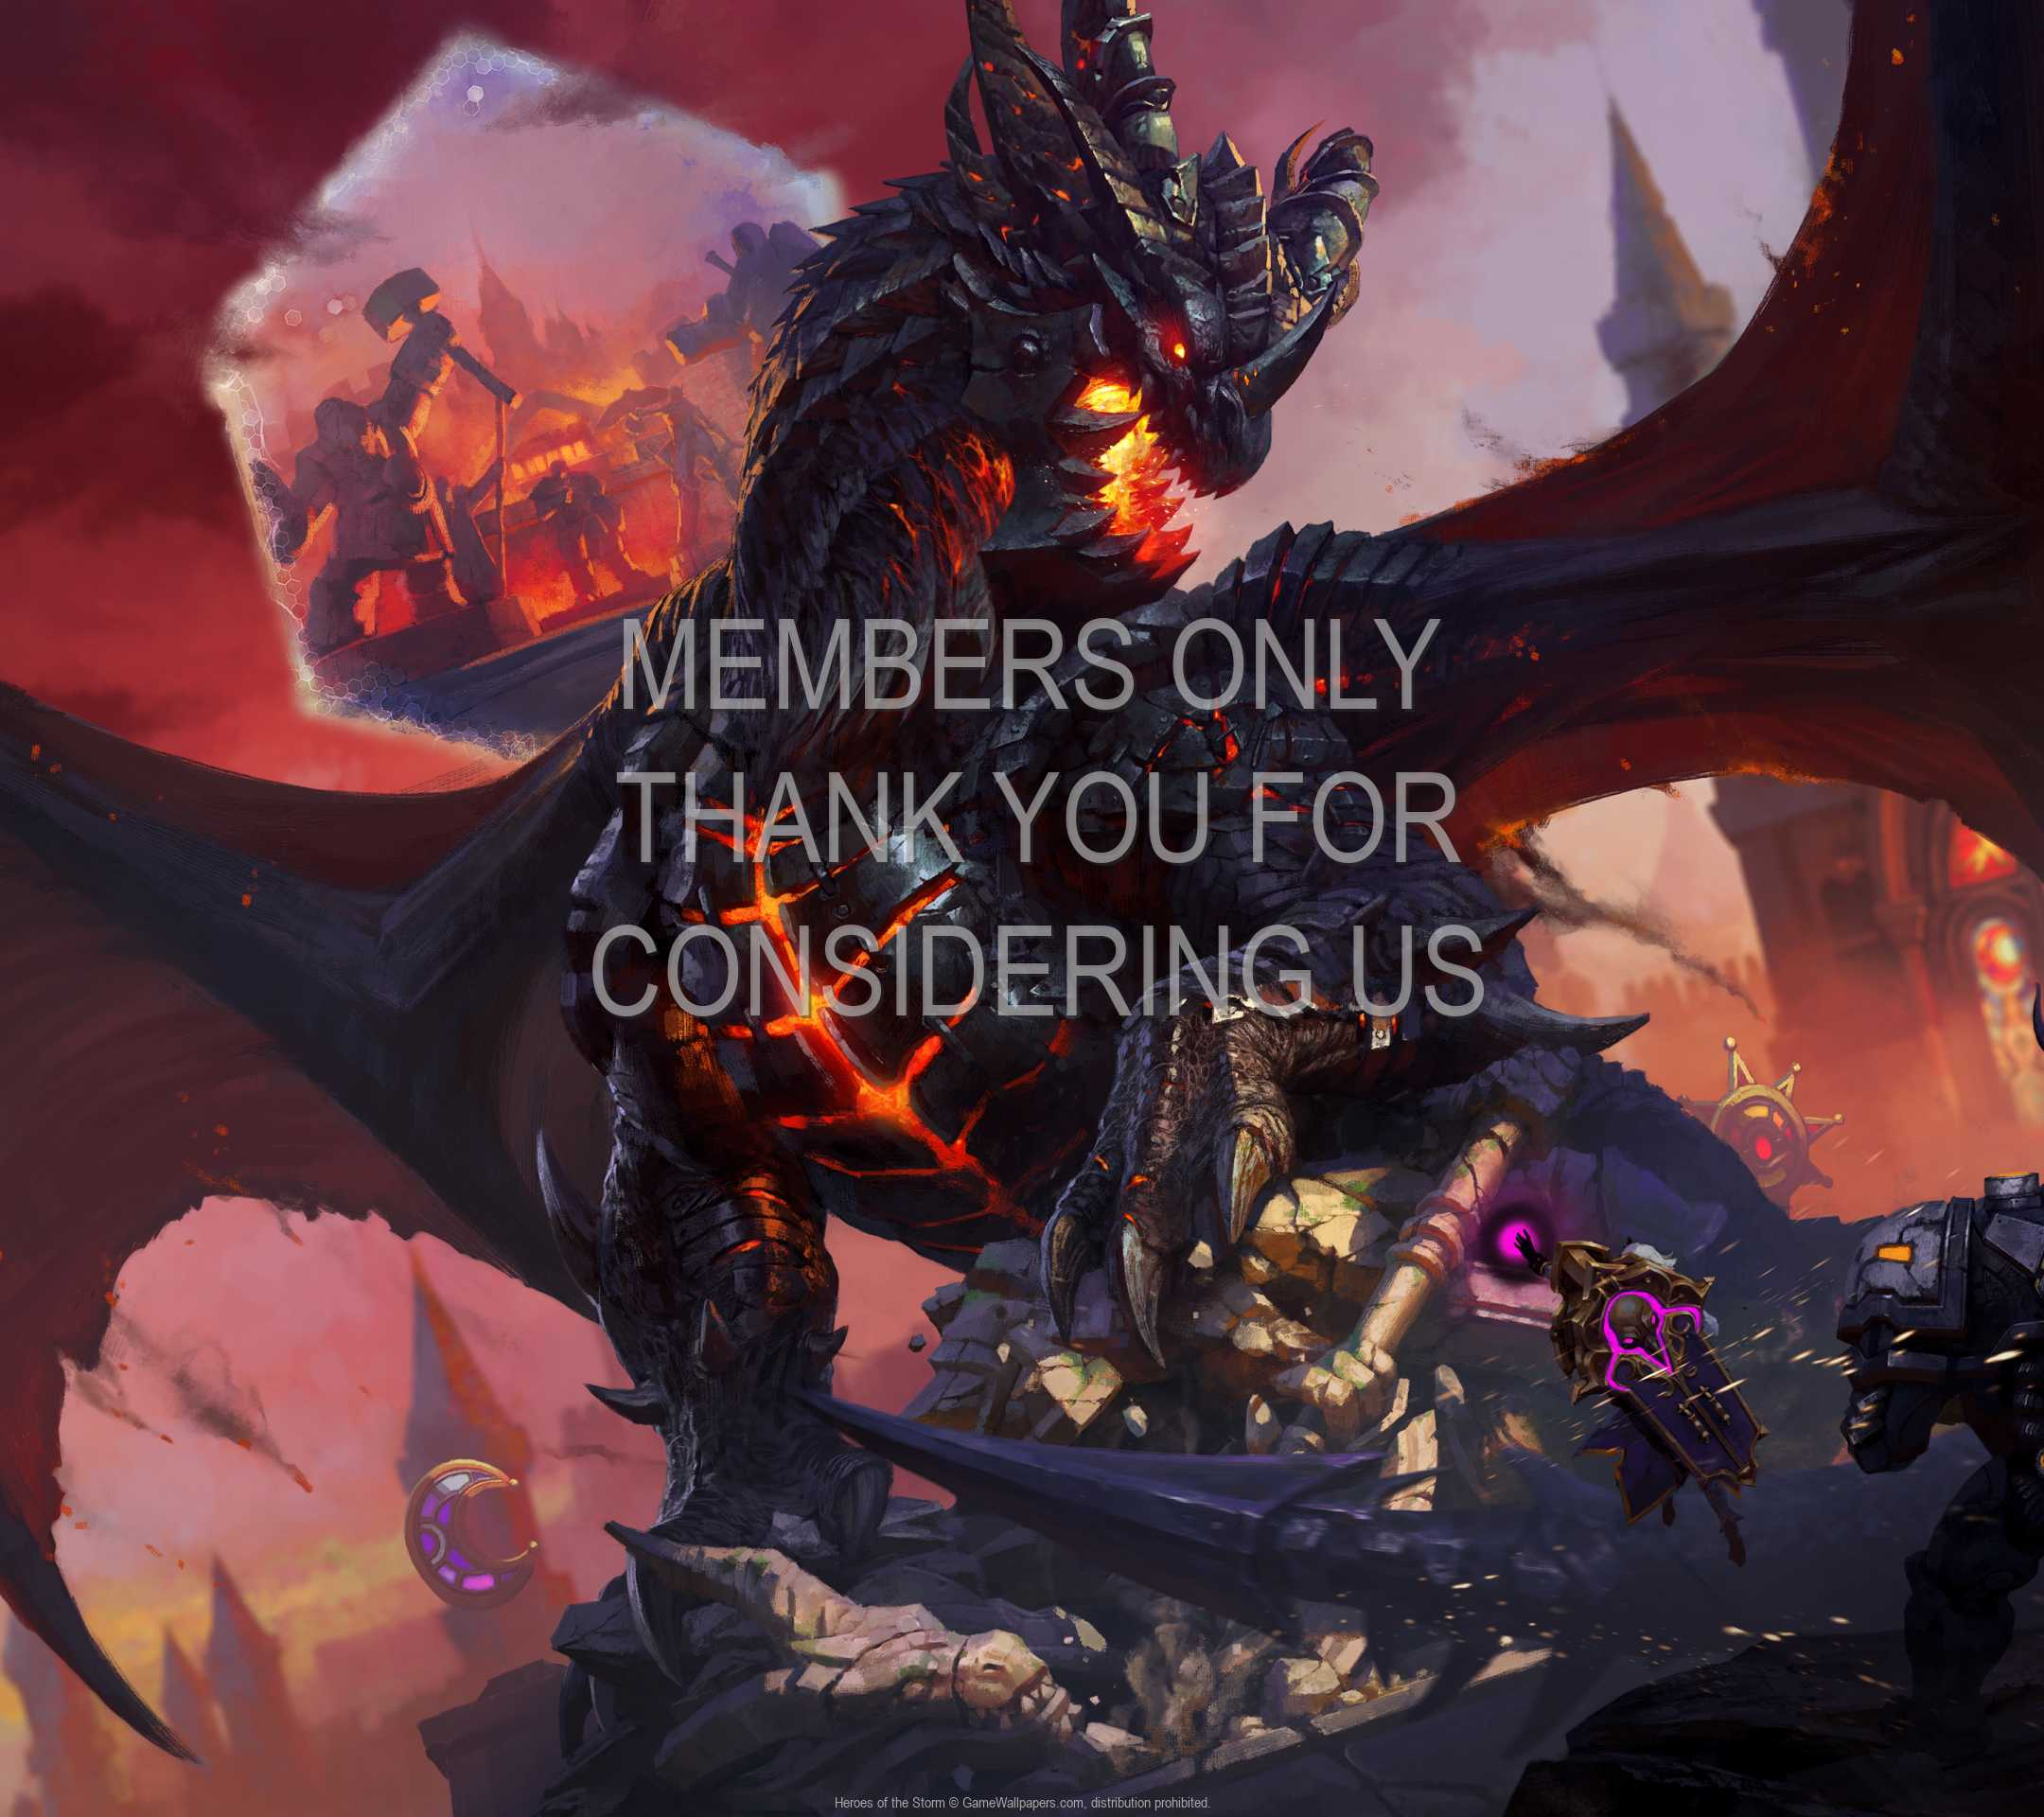 Heroes of the Storm 1080p Horizontal Handy Hintergrundbild 12